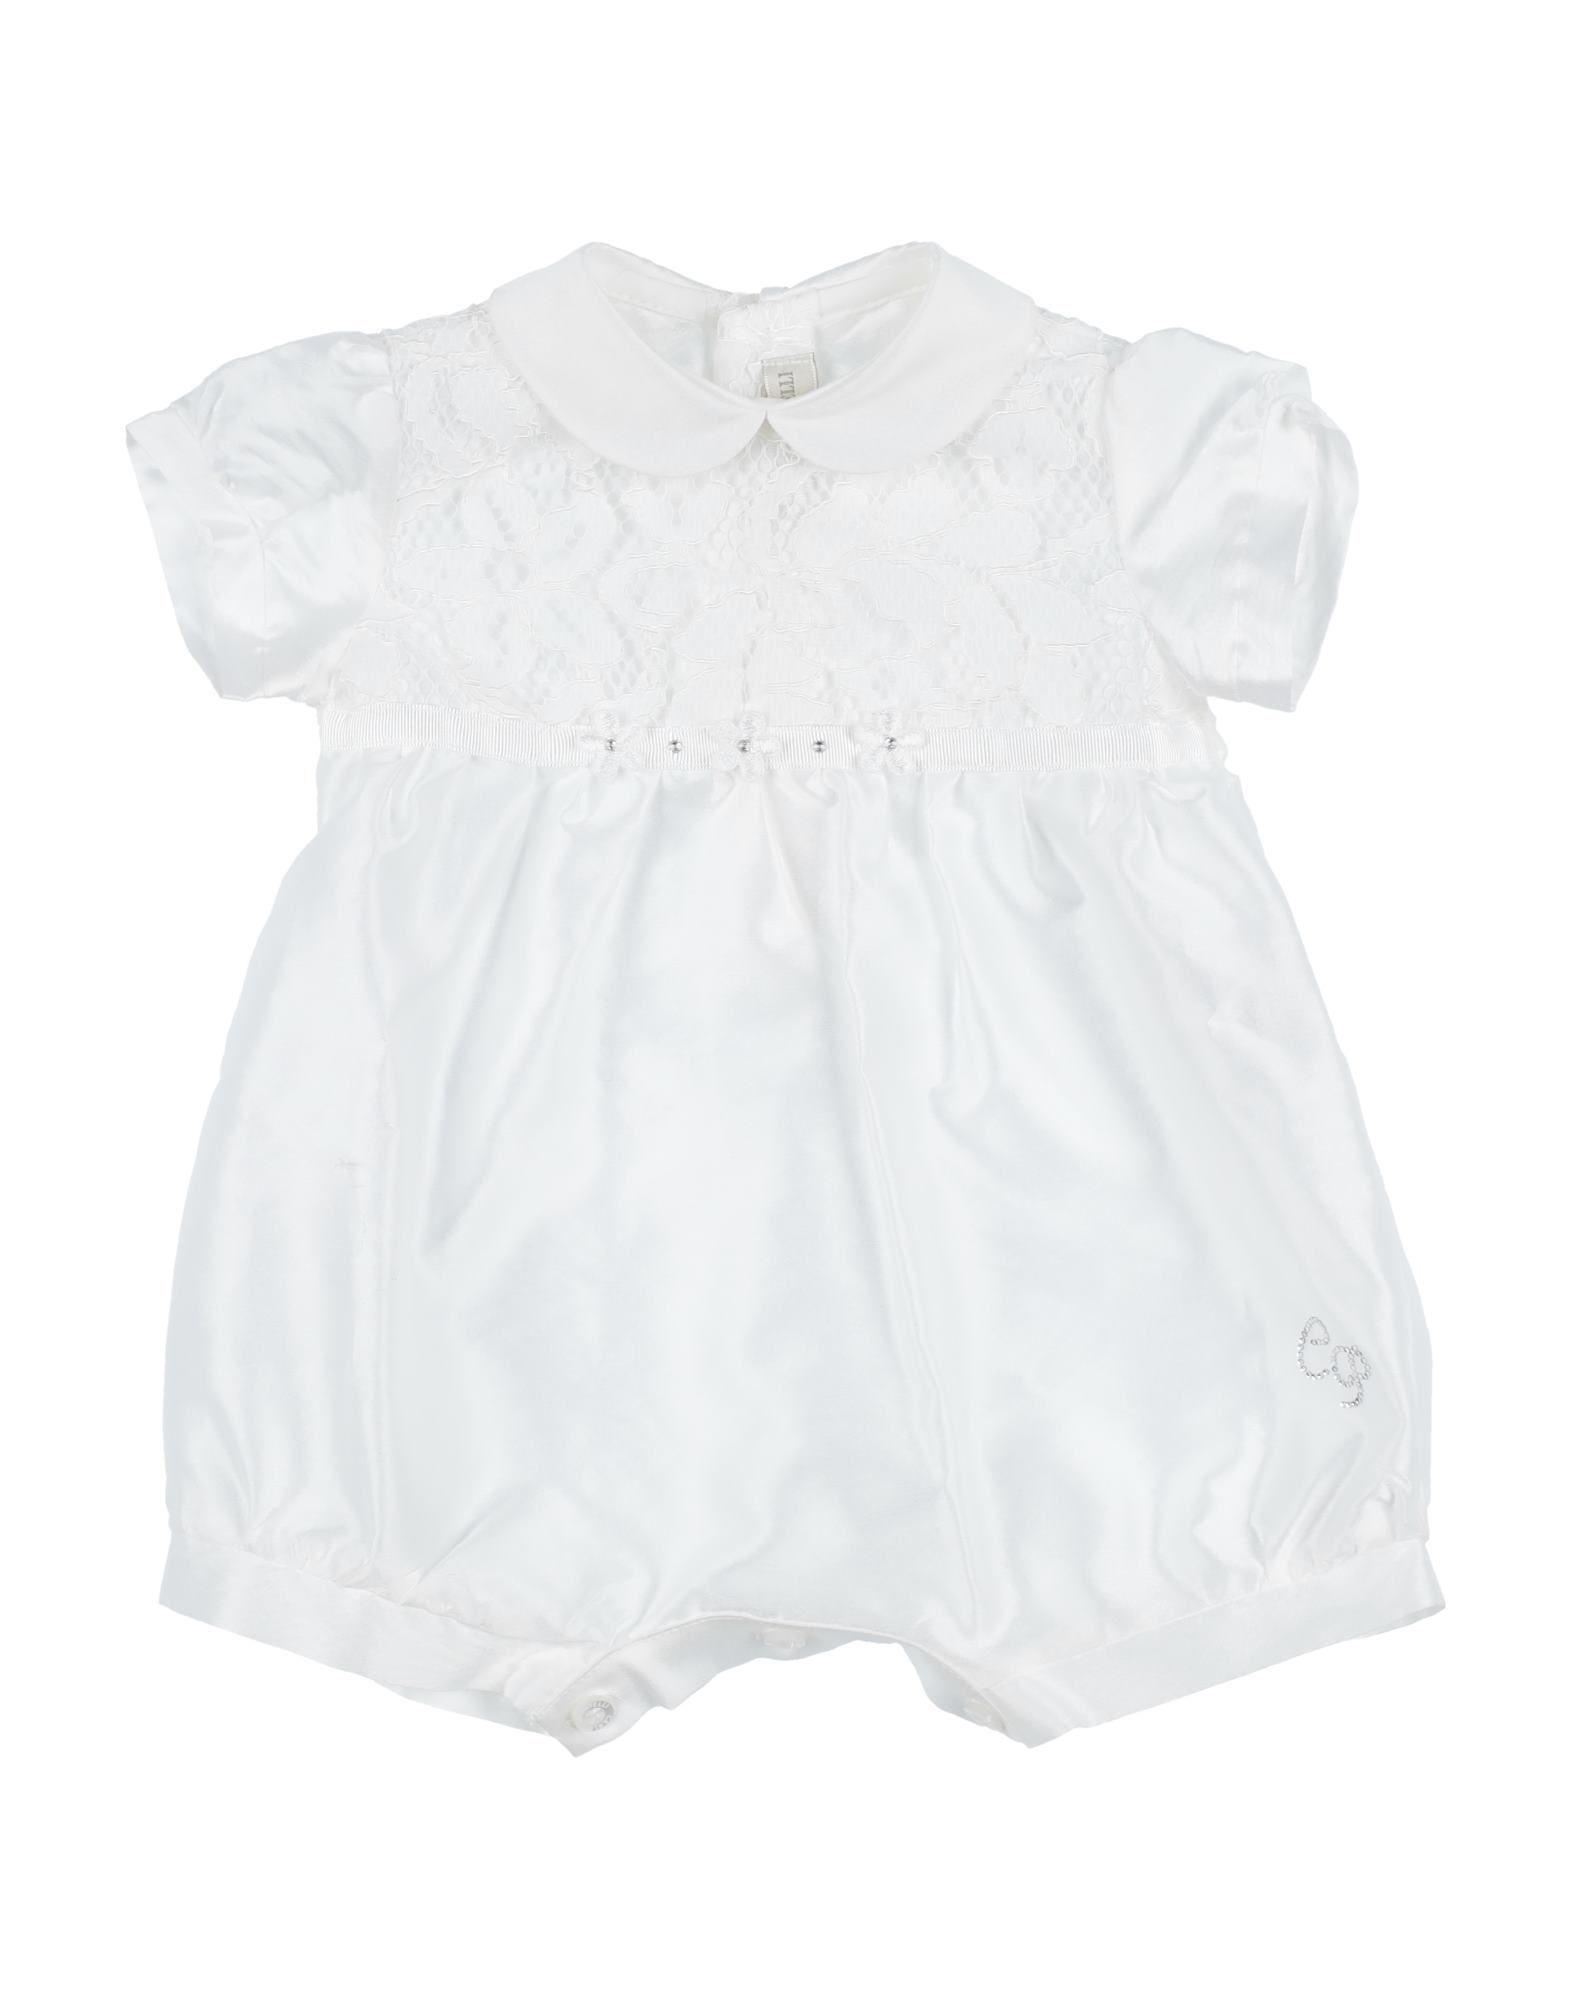 YOOX.COM(ユークス)《セール開催中》CARLO PIGNATELLI ガールズ 0-24 ヶ月 乳幼児用ロンパース アイボリー 1 コットン 93% / ポリウレタン 7%